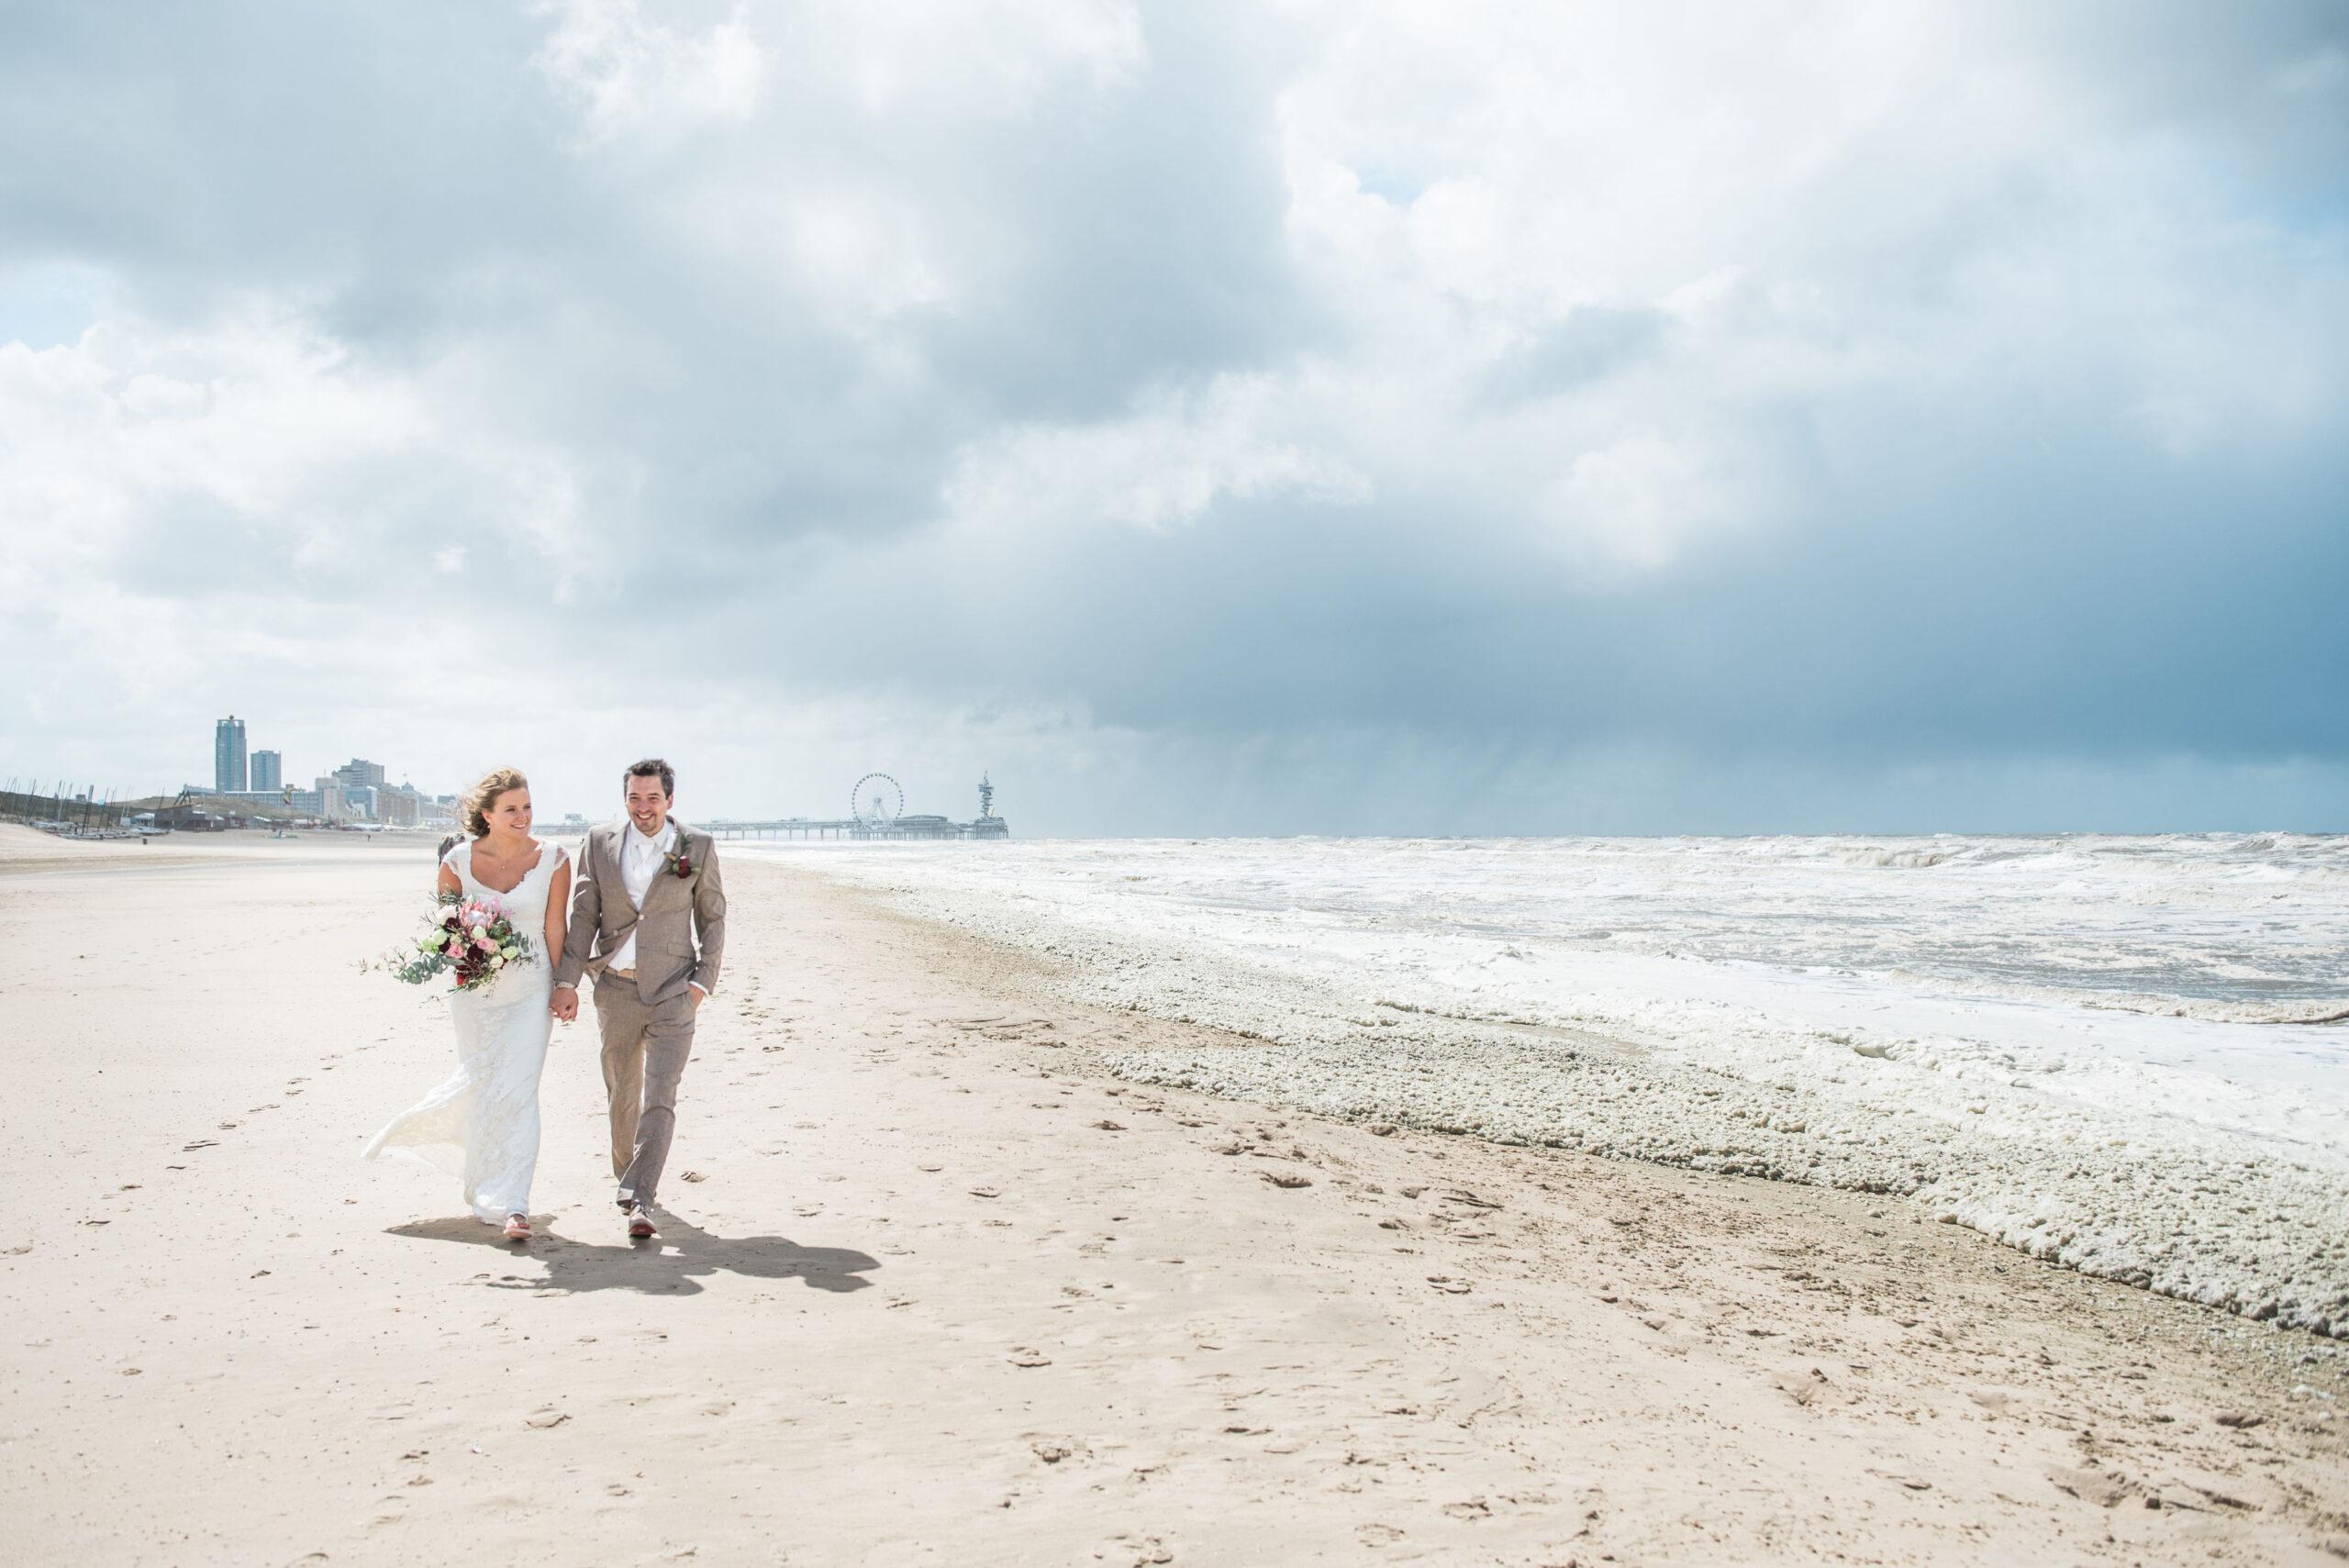 A bride and groom on the beach in Scheveningen